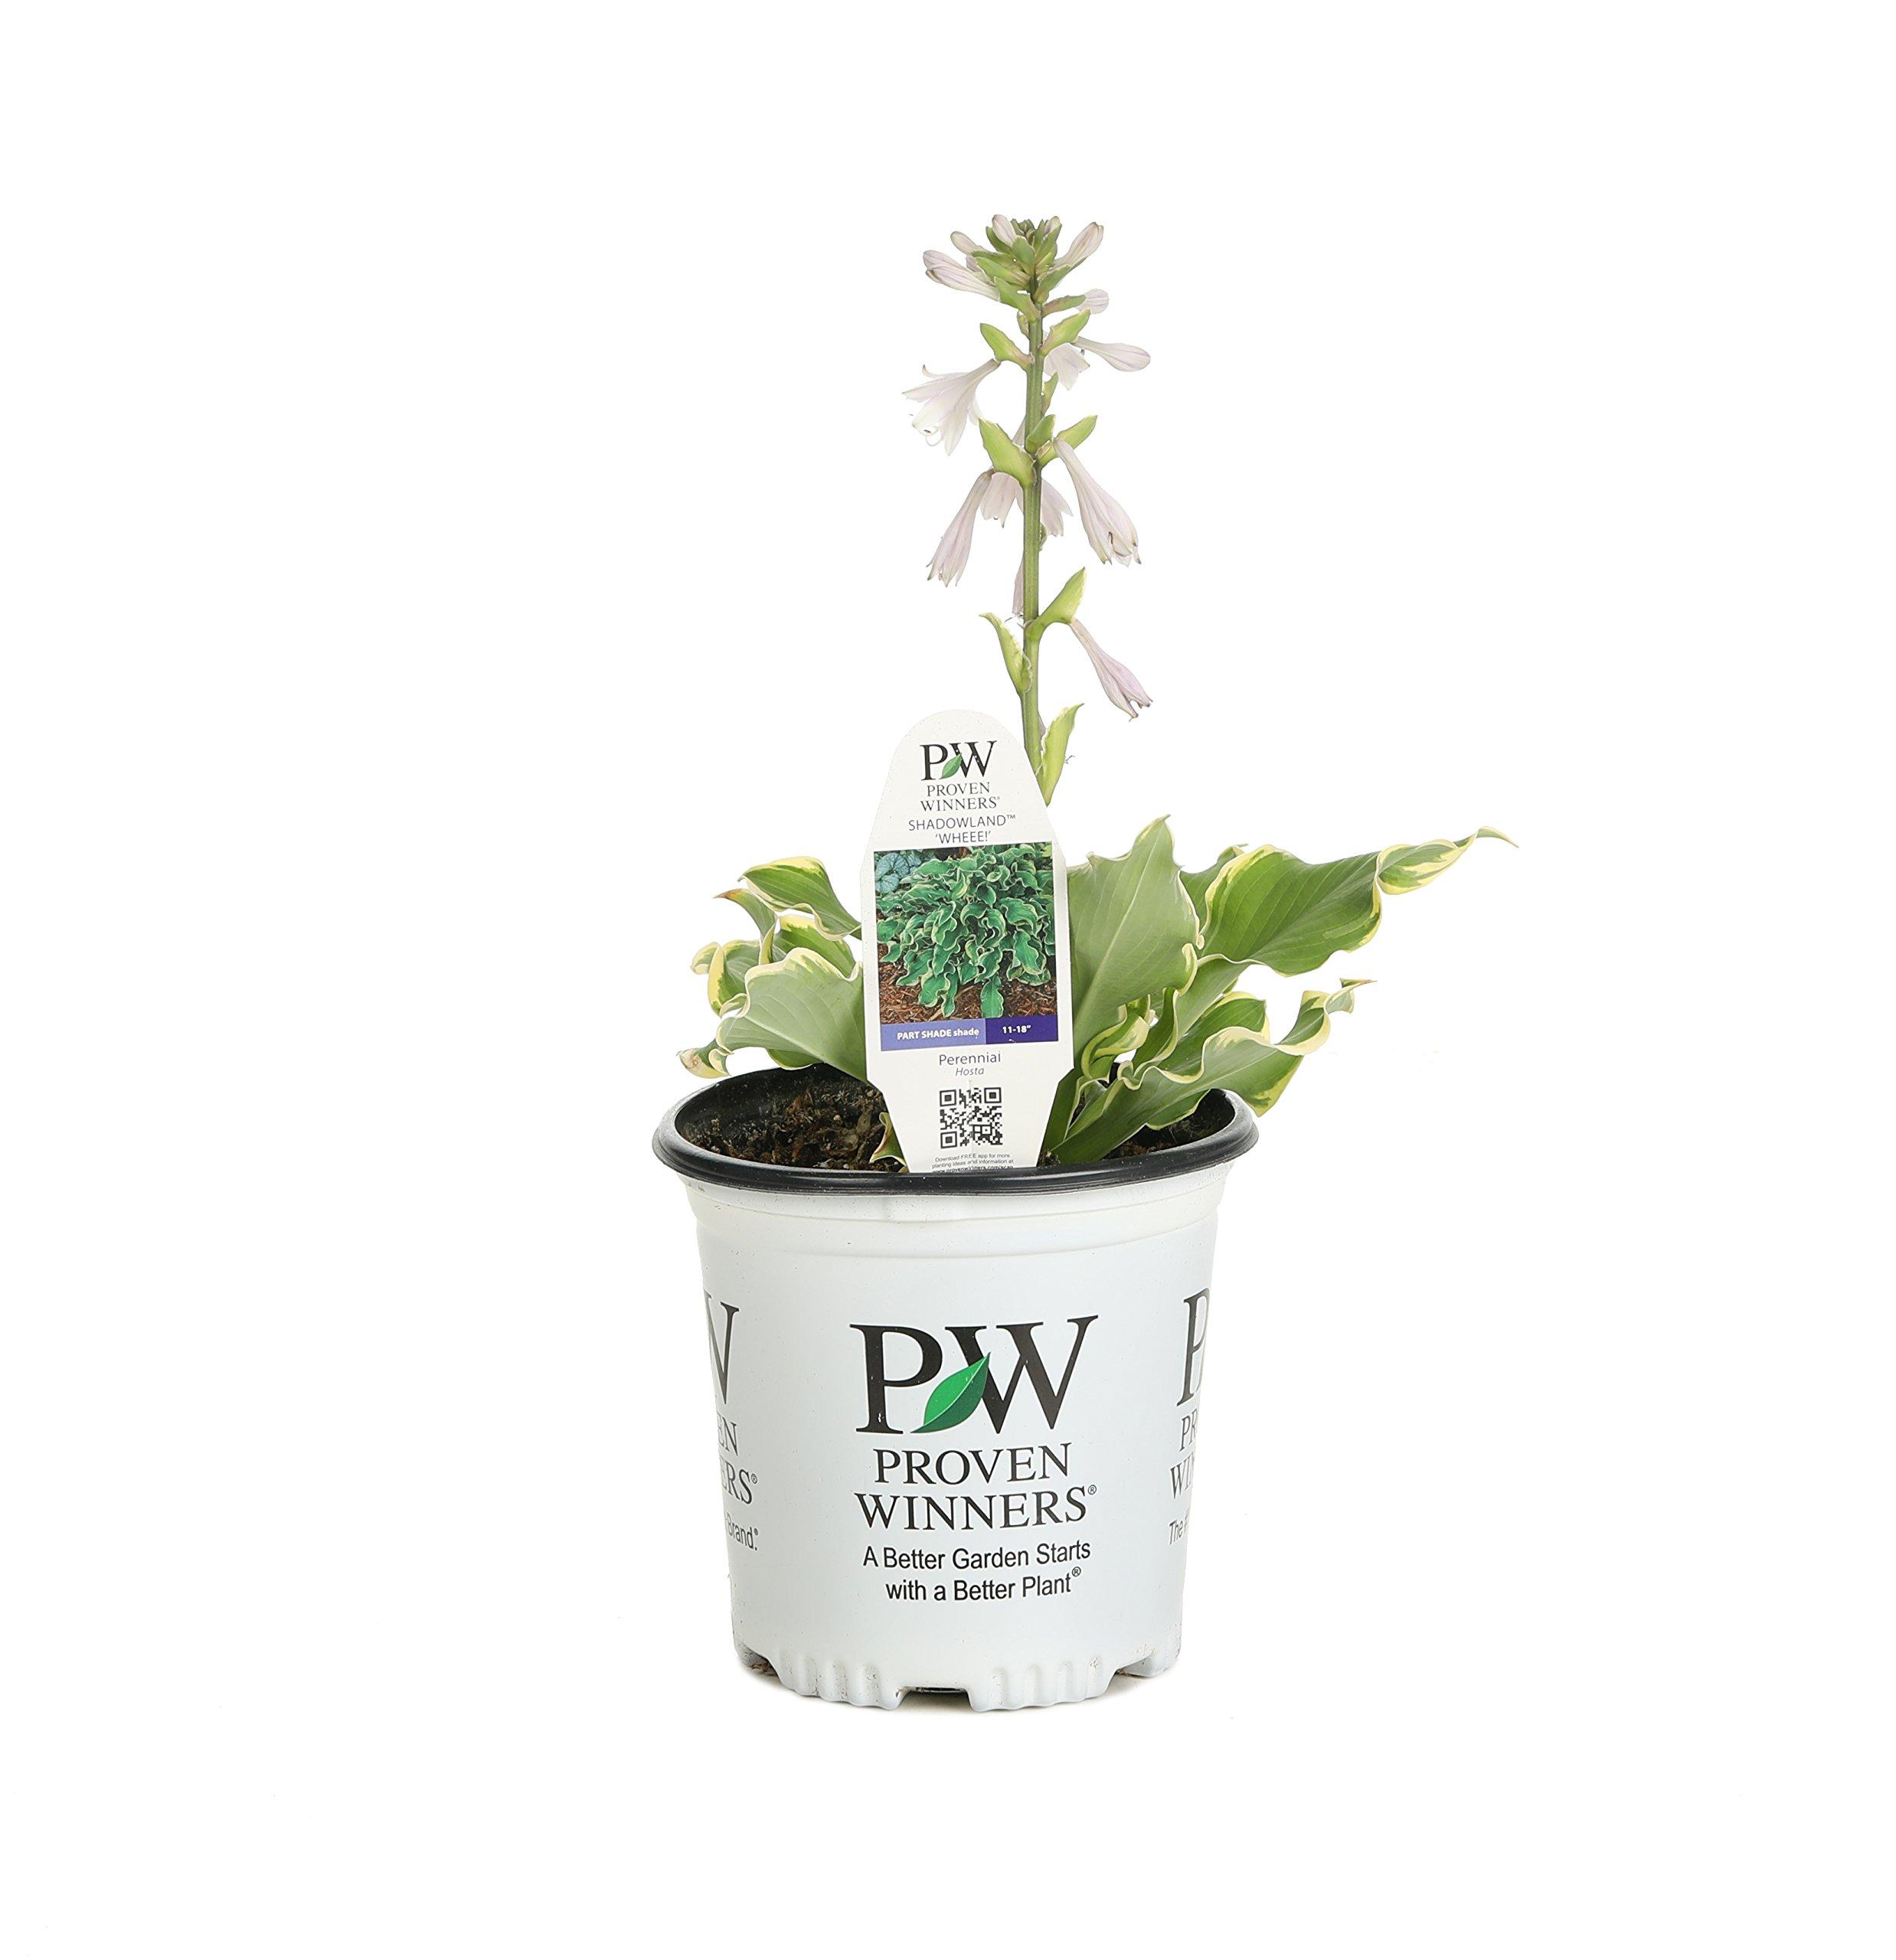 Shadowland Wheee! (Hosta) Live Plant,Green andCream Foliage, 0.65 Gallon